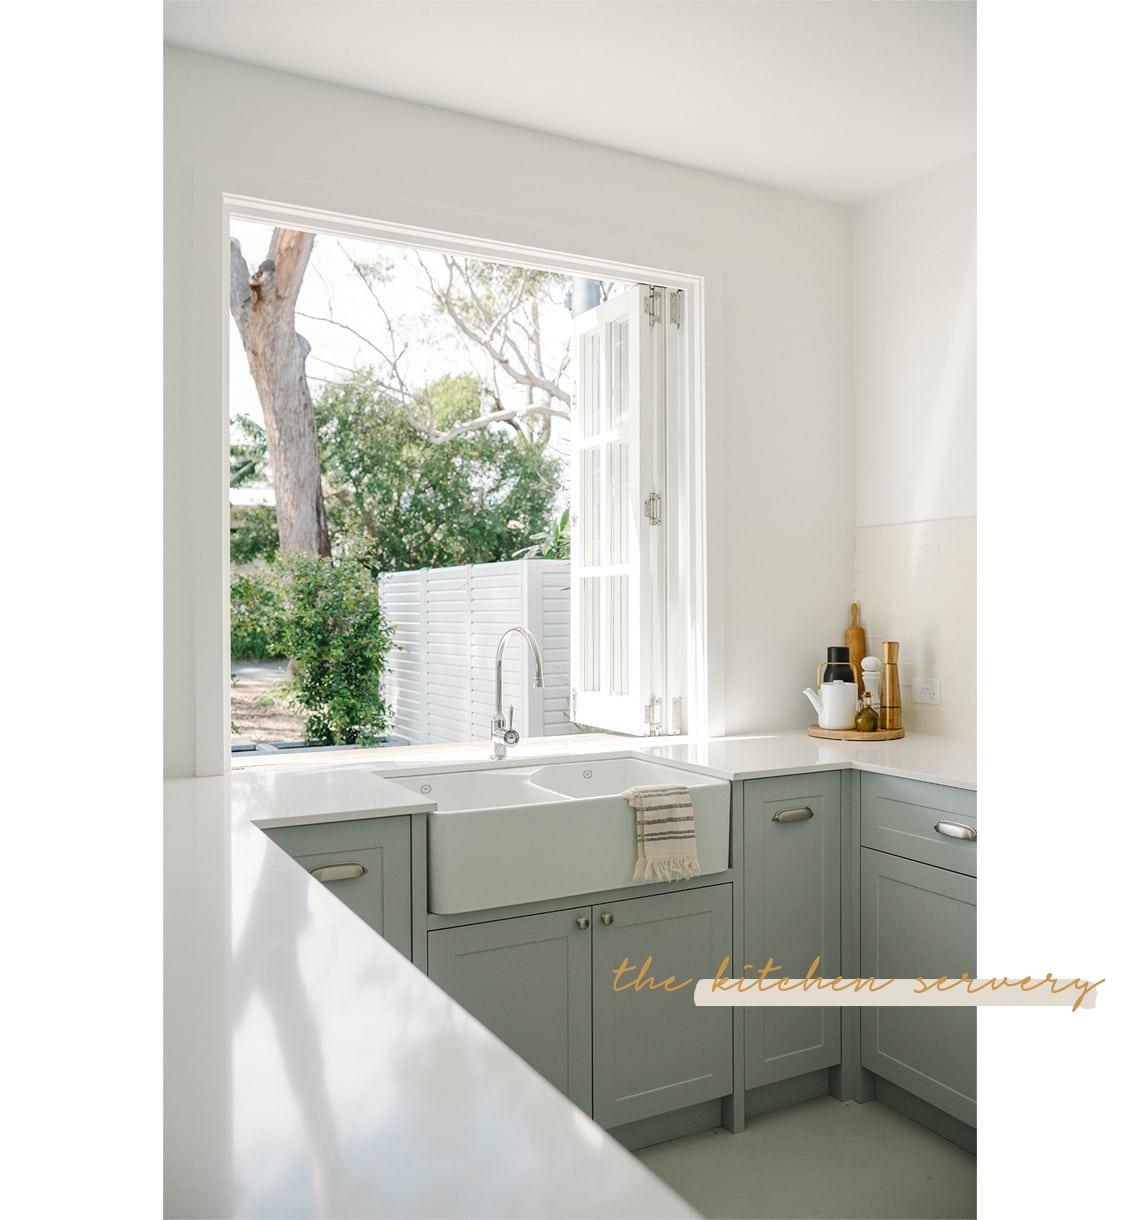 Salt Kitchen Servery Window